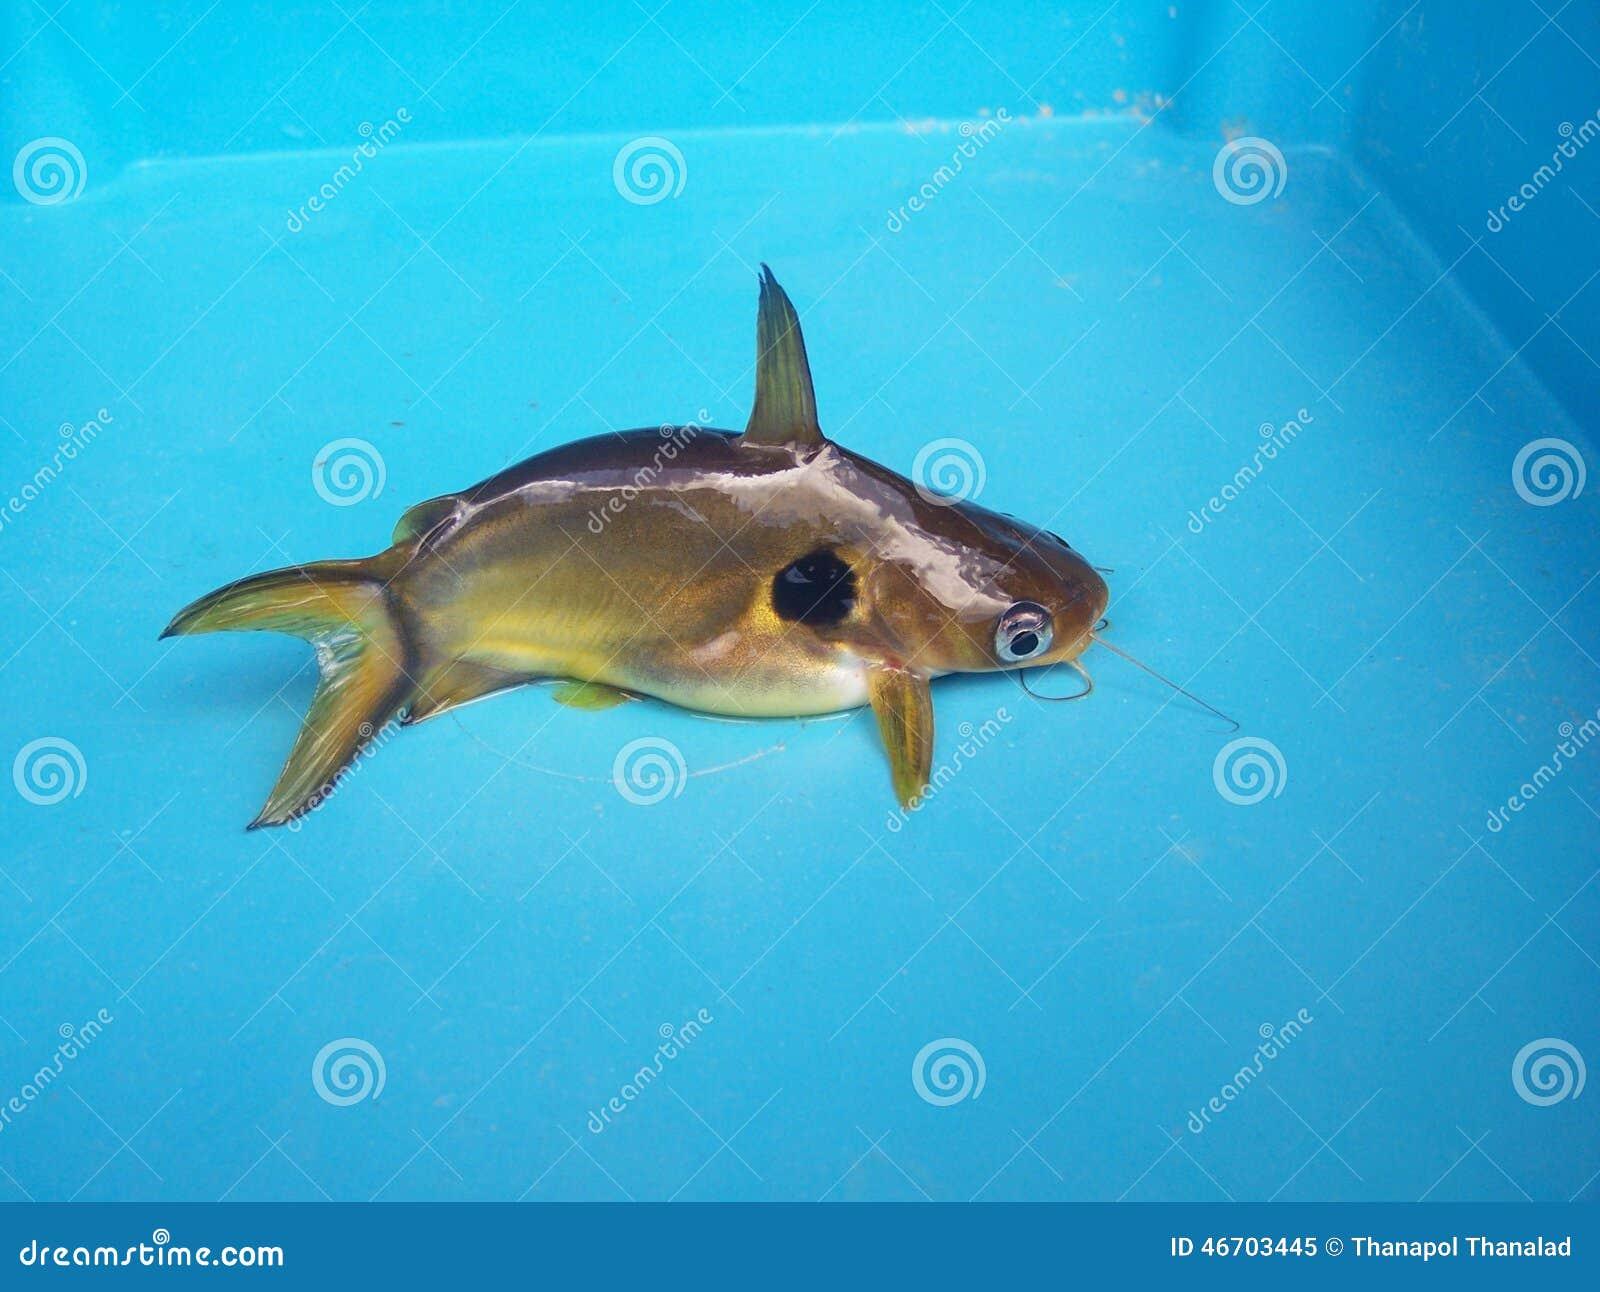 Fish aquarium and good luck - Gold Catfish Pets Gives Good Luck